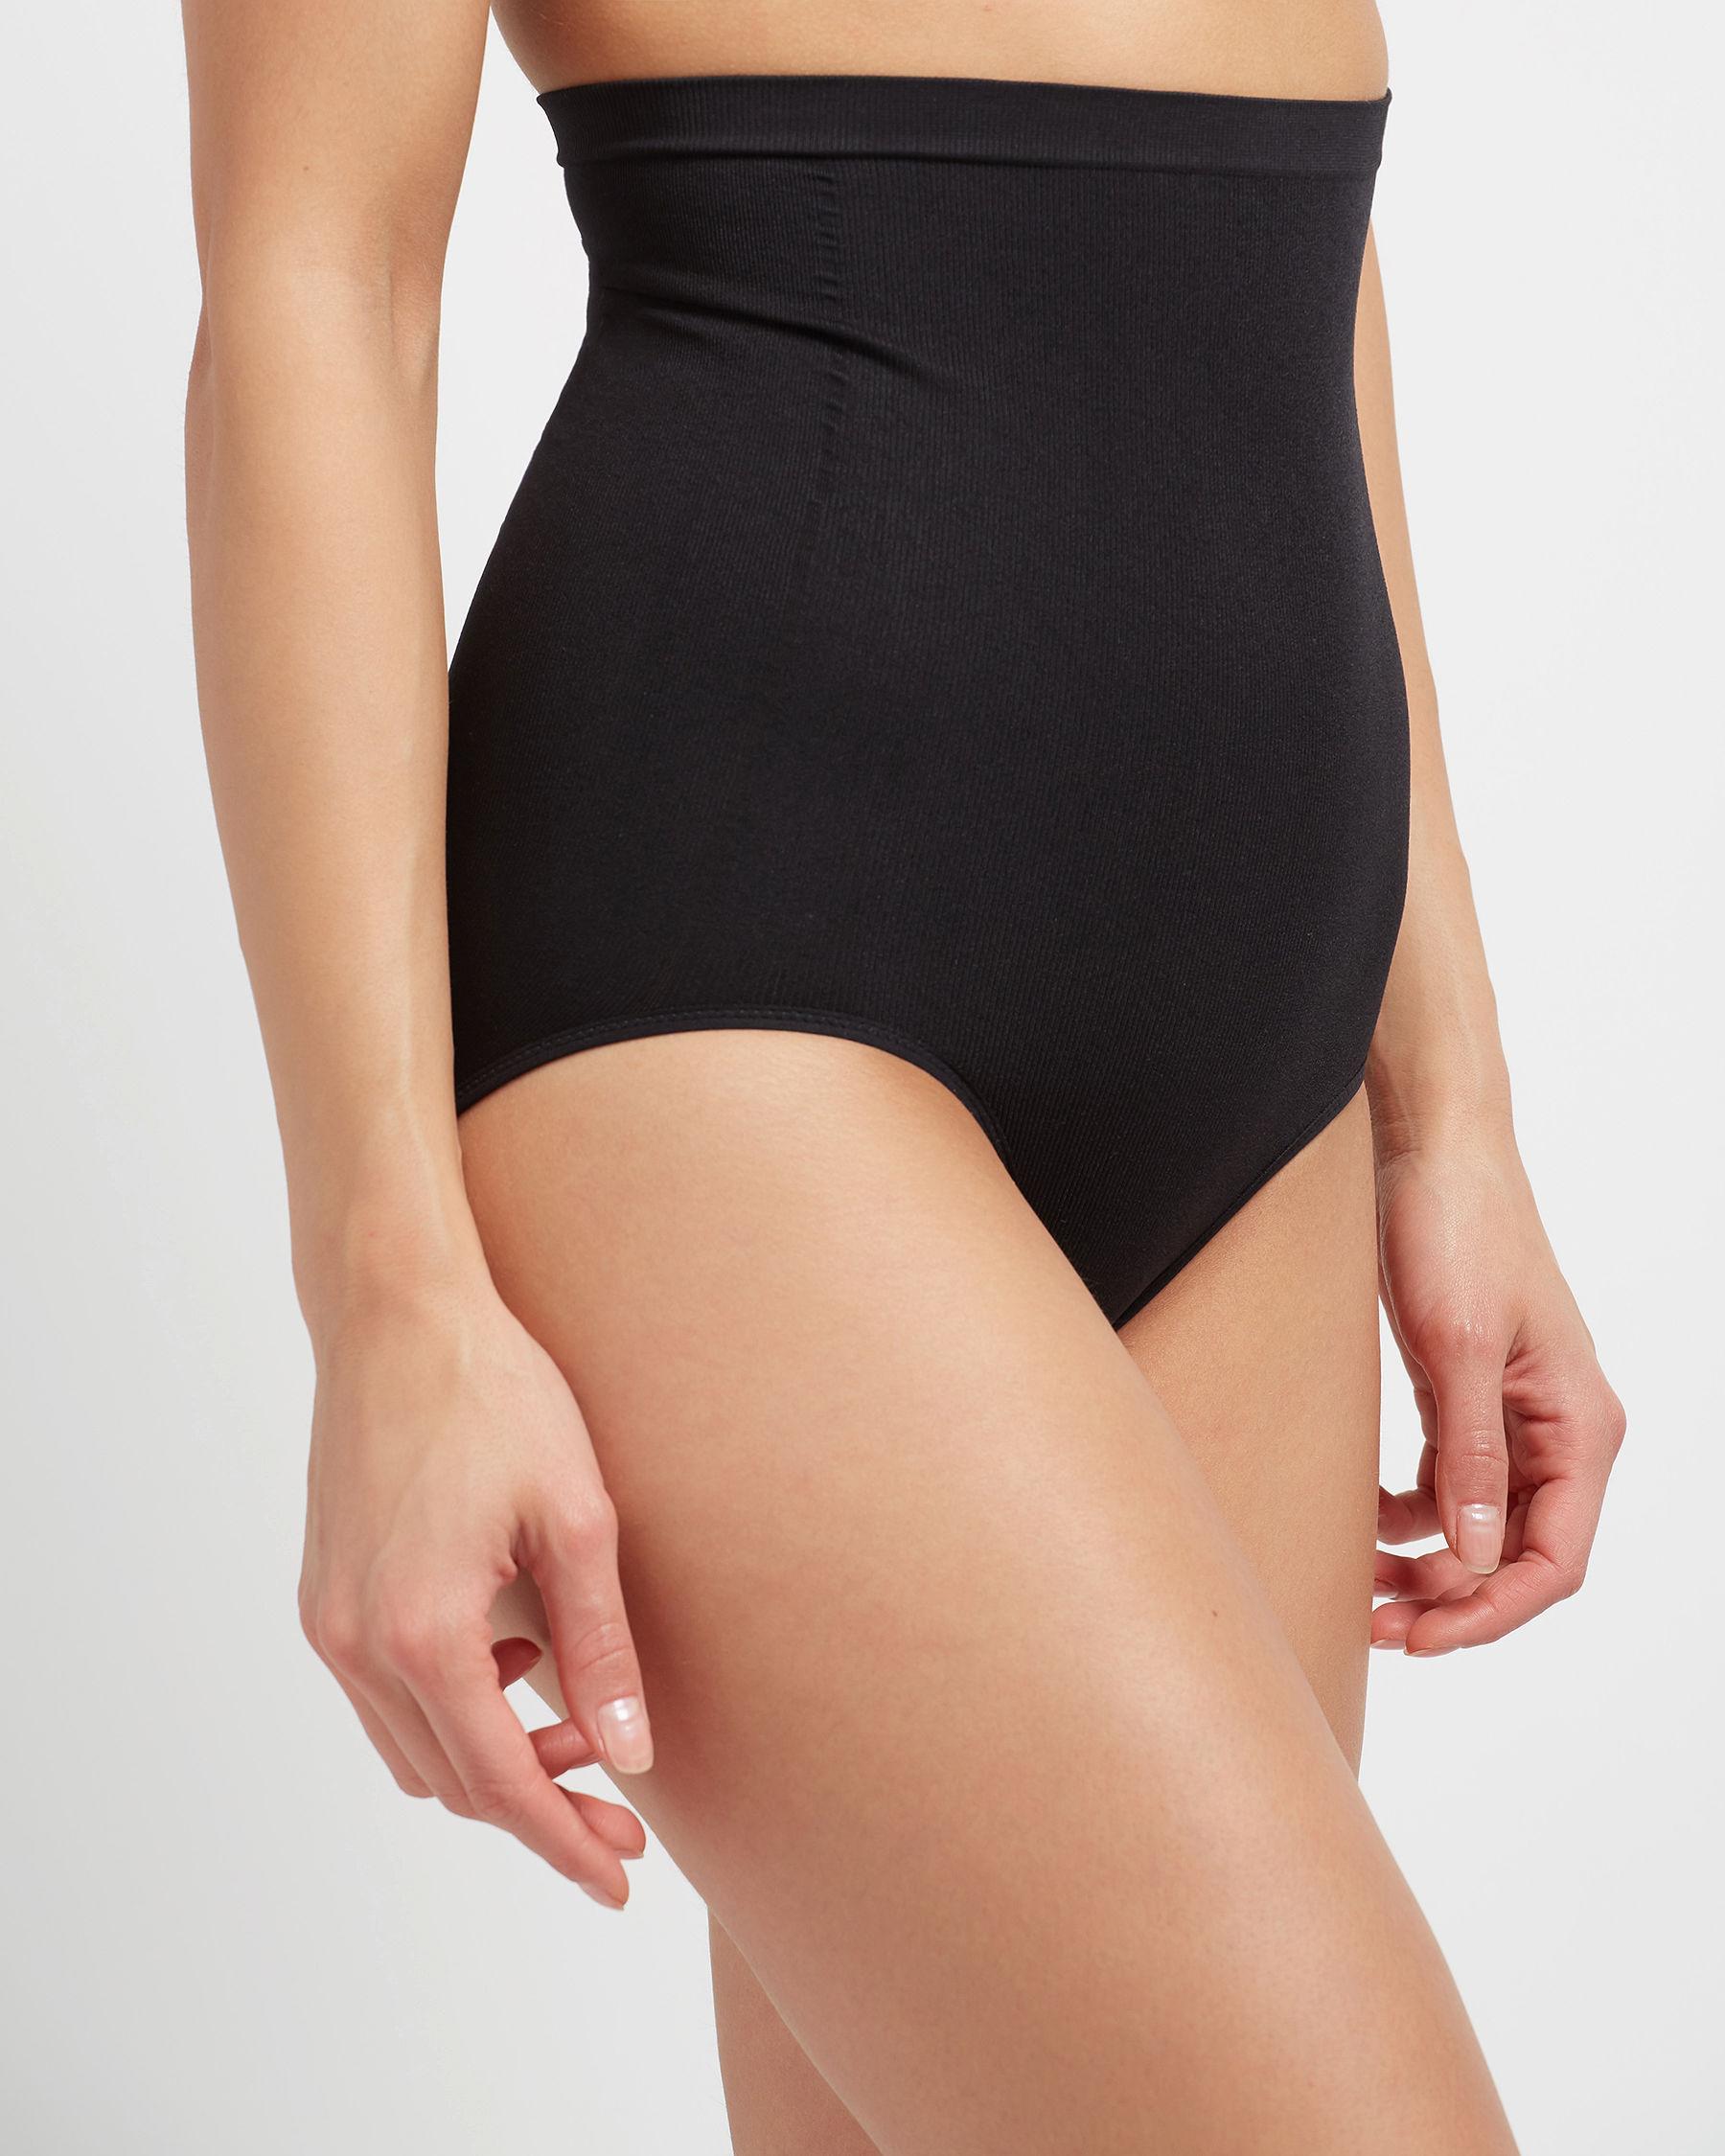 LA VIE EN ROSE Bikini Light Control Black 388-122-0-00 - View1